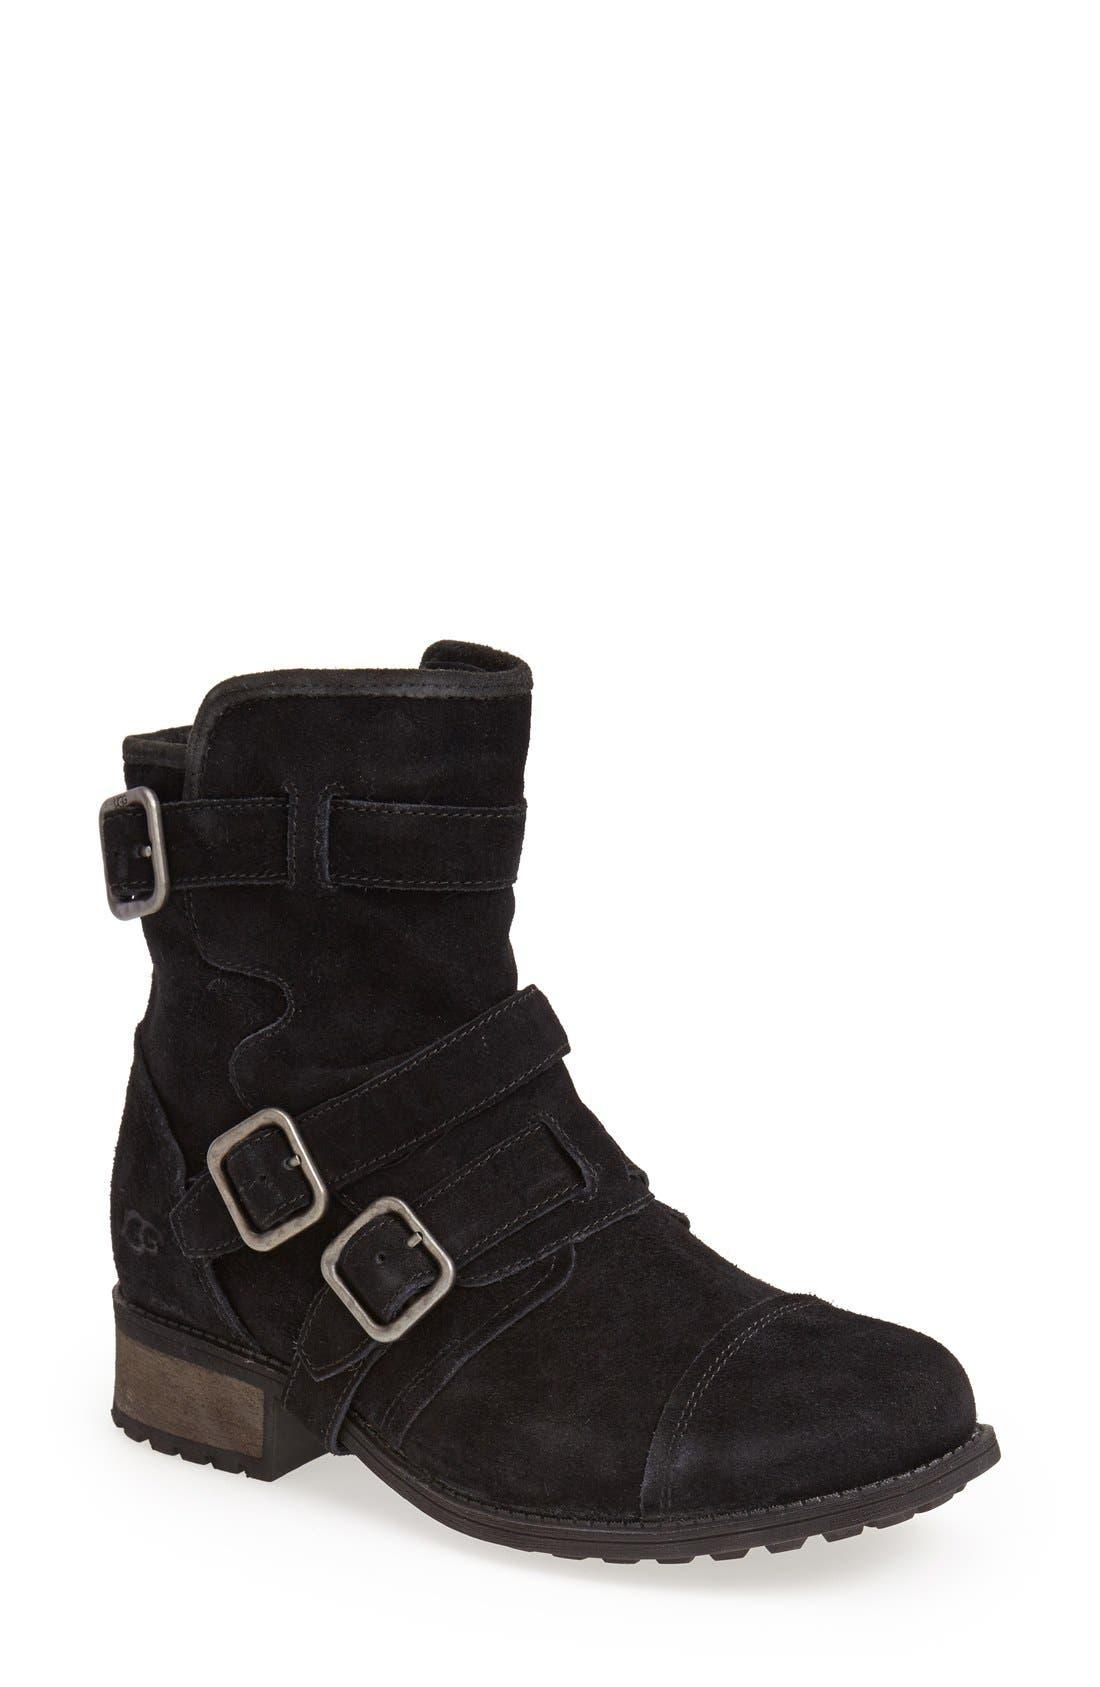 Australia 'Finney' Suede Moto Boot, Main, color, 001